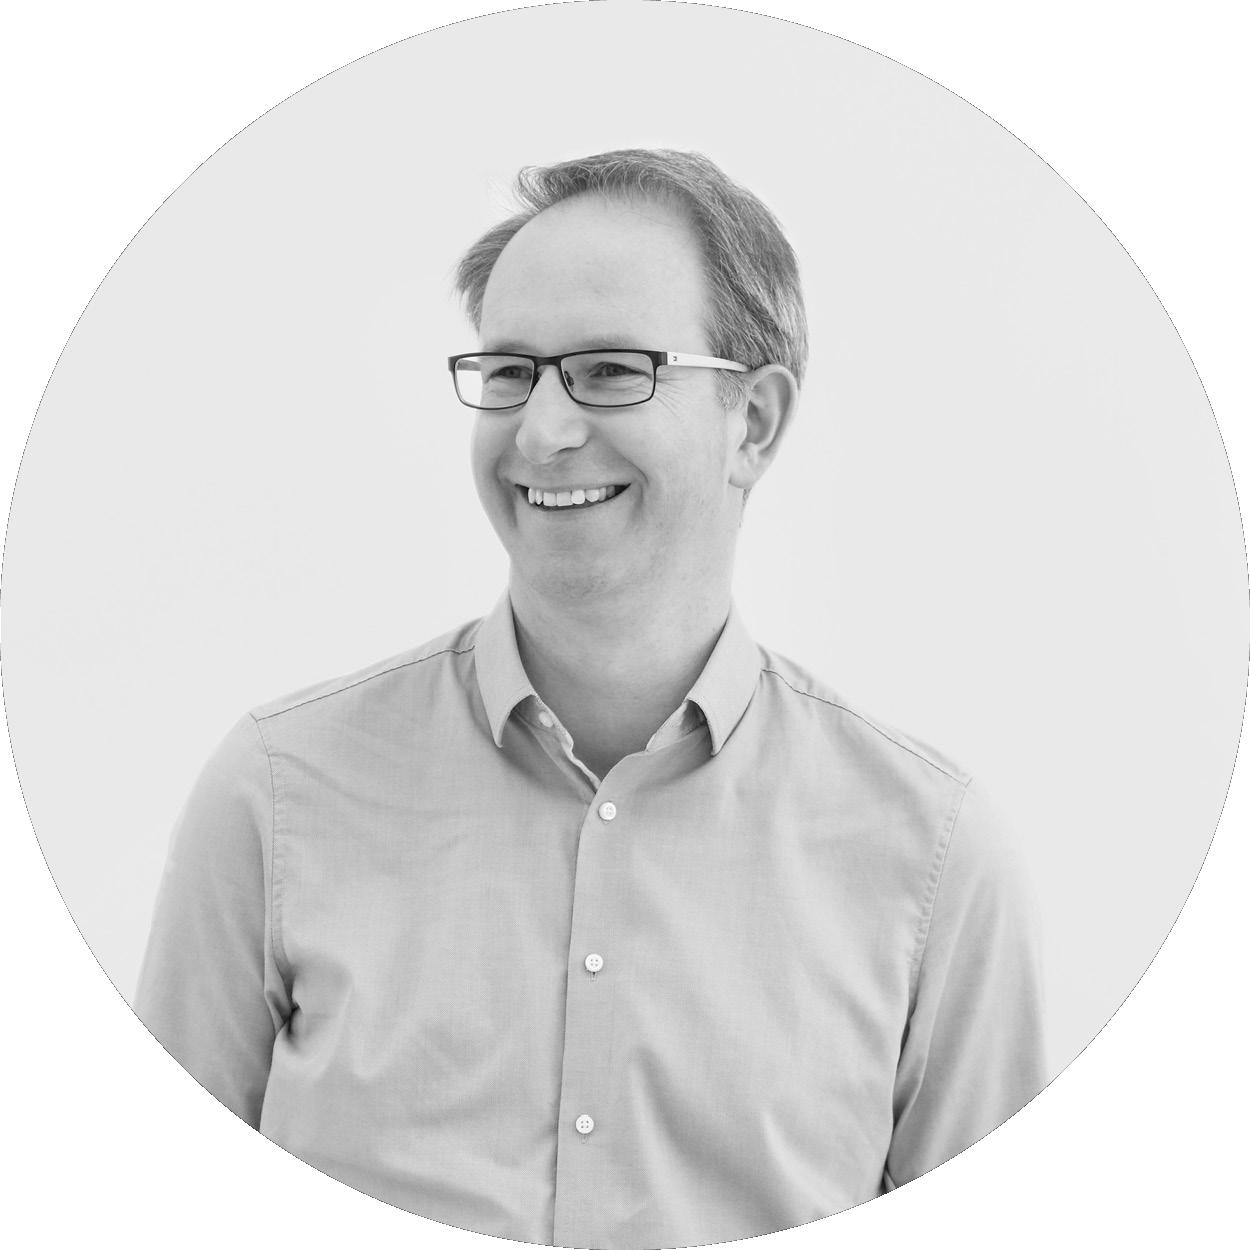 David Belton - Engineering Consultant